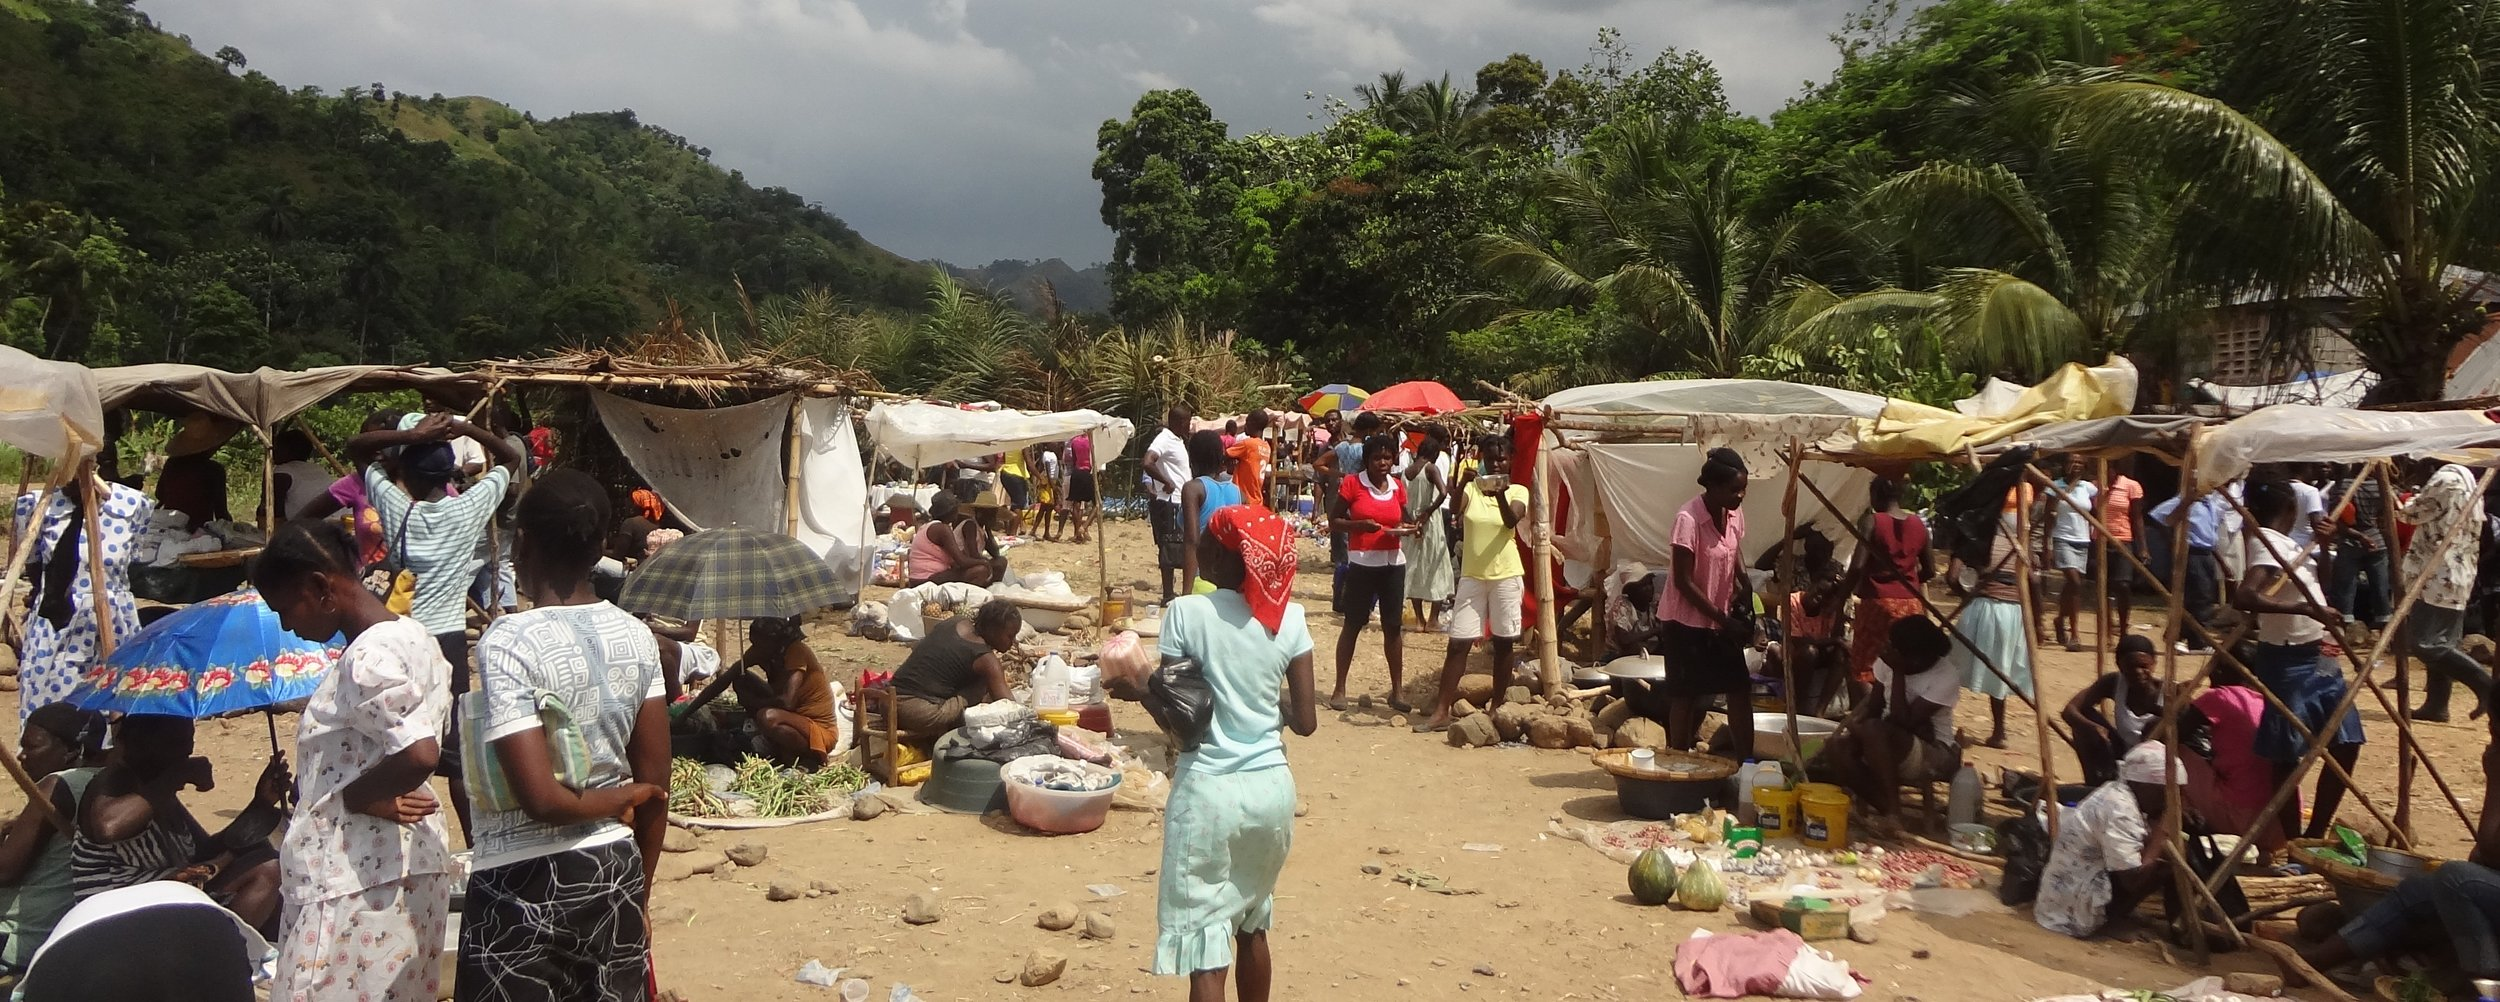 The marketplace at La Soufriere.